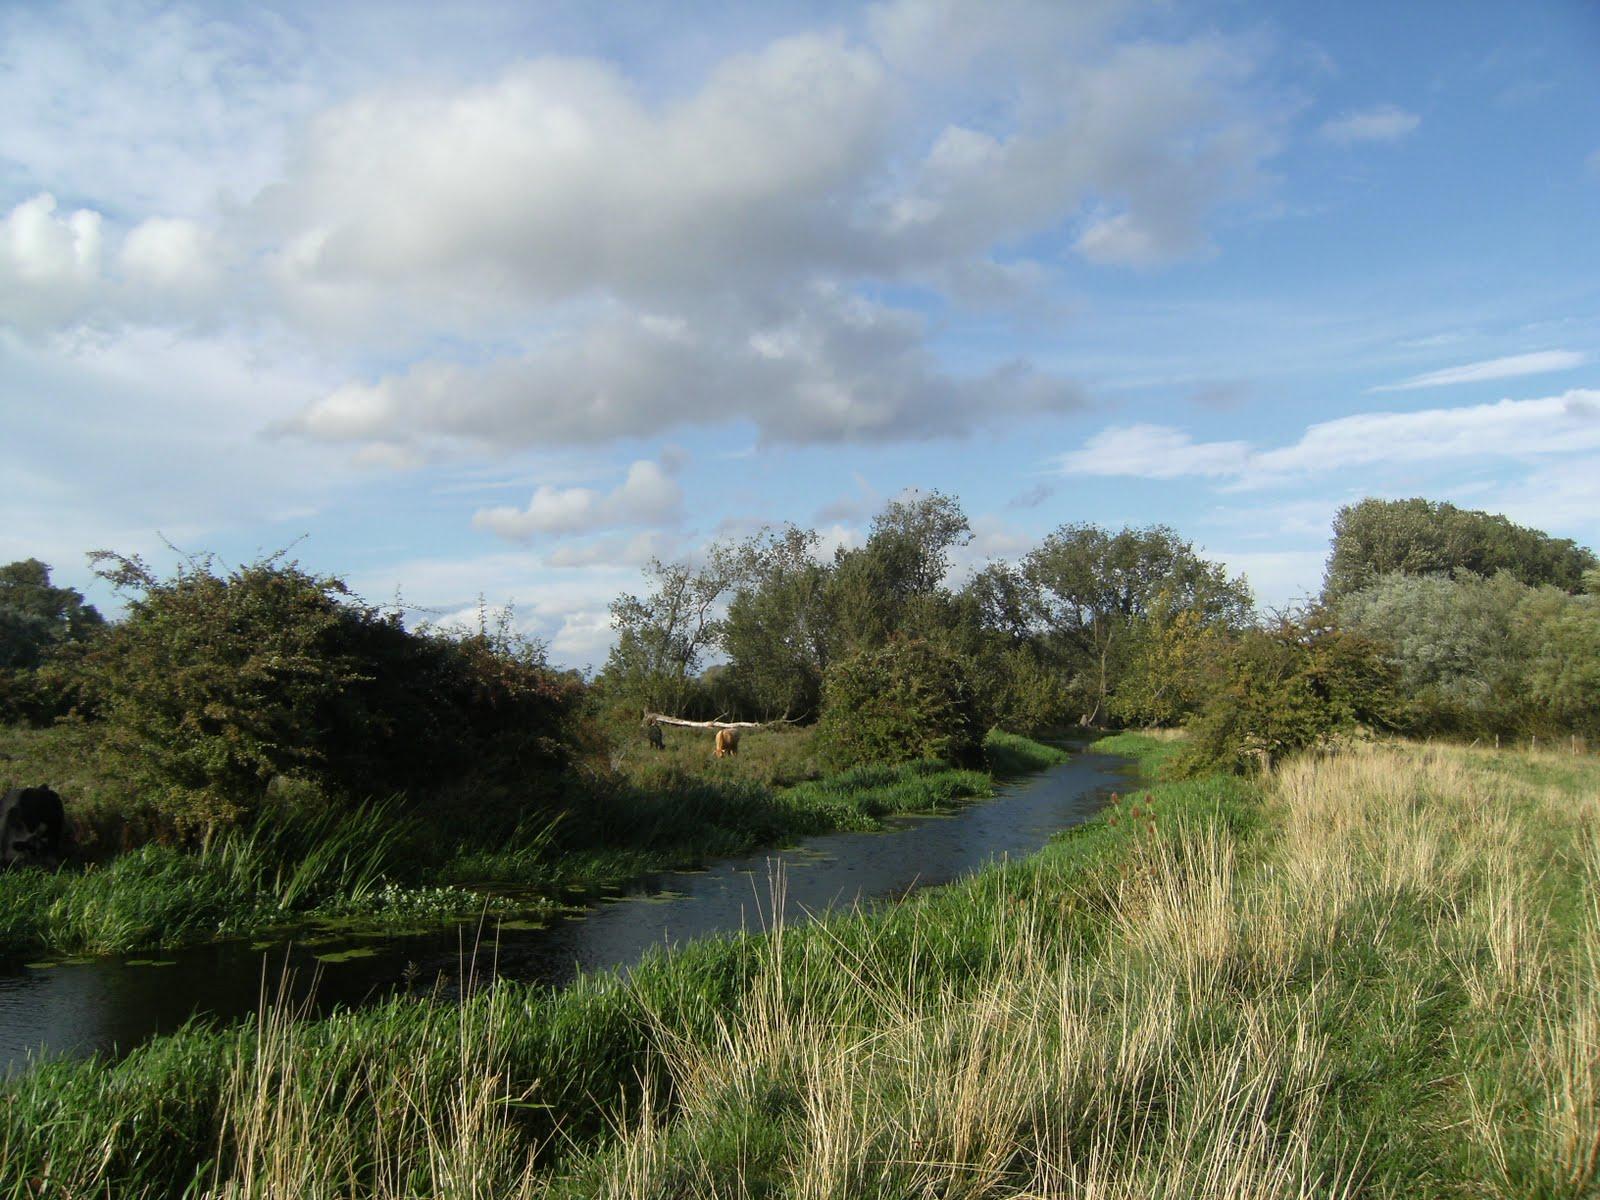 DSCF9480 Between Houghton and Godmanchester